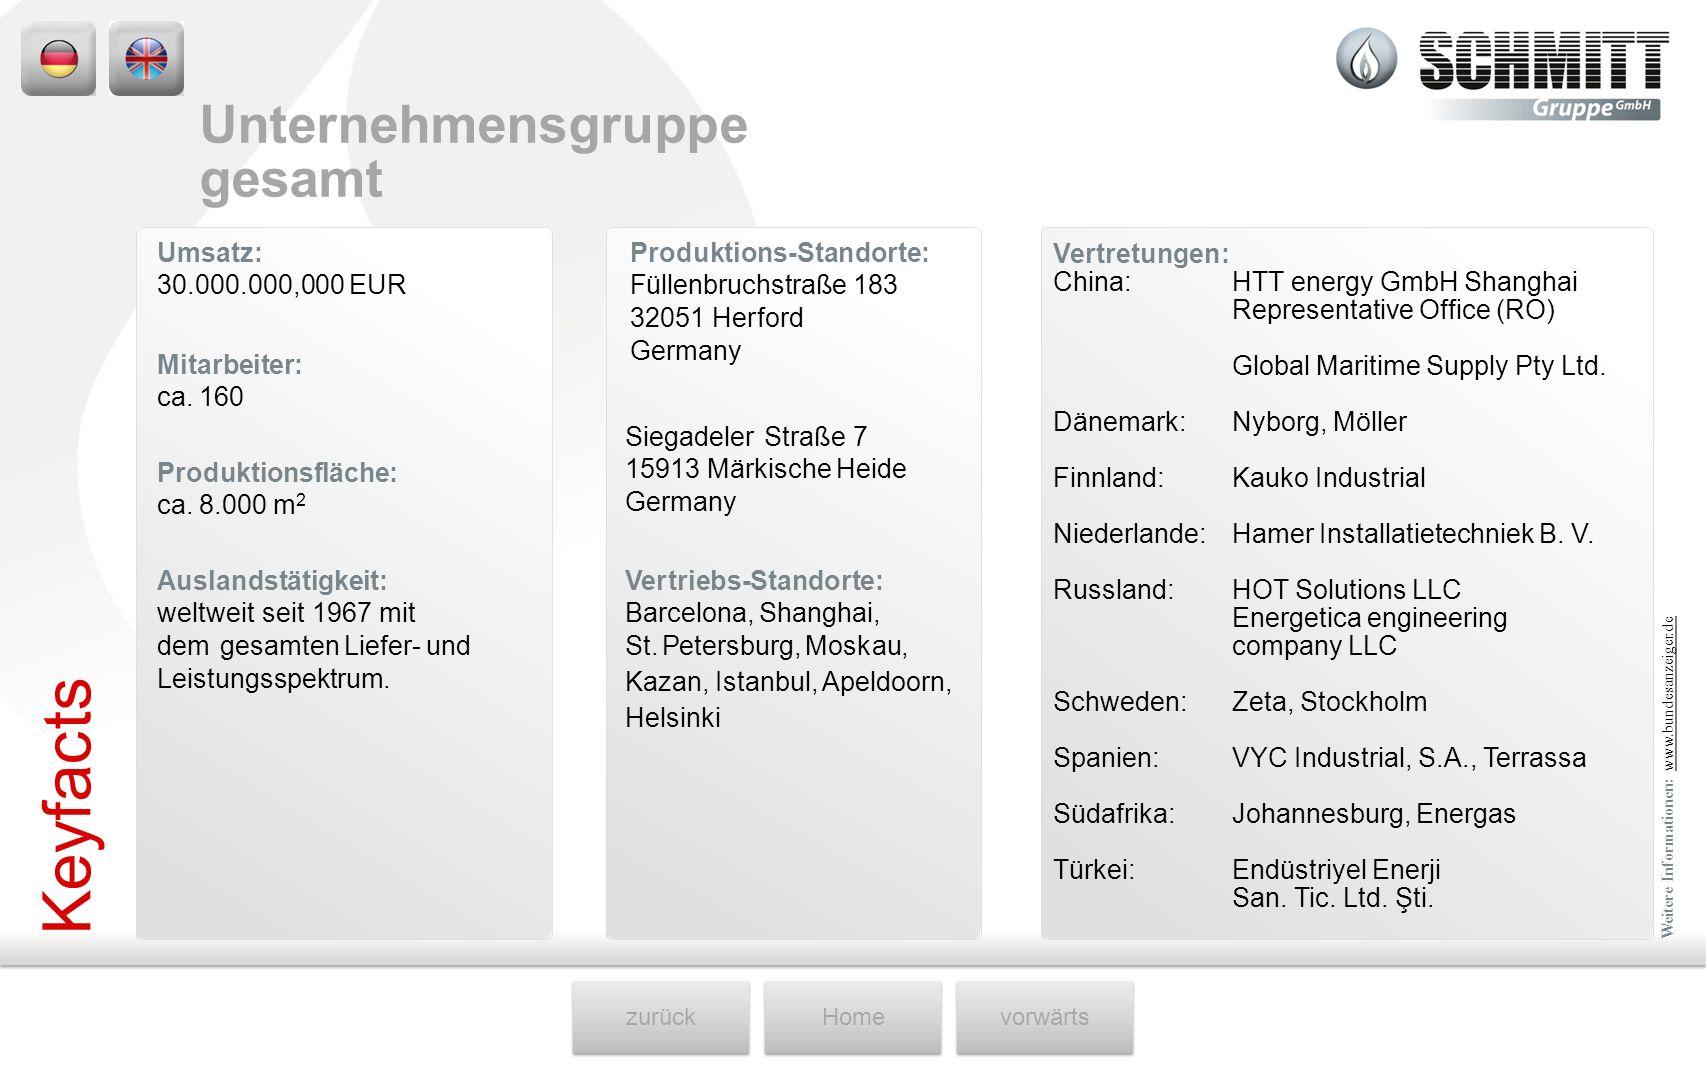 zurückHomevorwärts Geschäftsanschrift: Füllenbruchstraße 201 32051 Herford Germany Gründungsjahr: 2010 Bankverbindungen: Sparkasse Herford BLZ: Kto.-Nr.: IBAN: BIC: 494 501 20 79 566 DE91 4945 0120 0000 0795 66 WLADE44 Stammkapital: 100.000,00 EUR Deutsche Bank AG BLZ: Kto.-Nr.: IBAN: BIC: Tel.